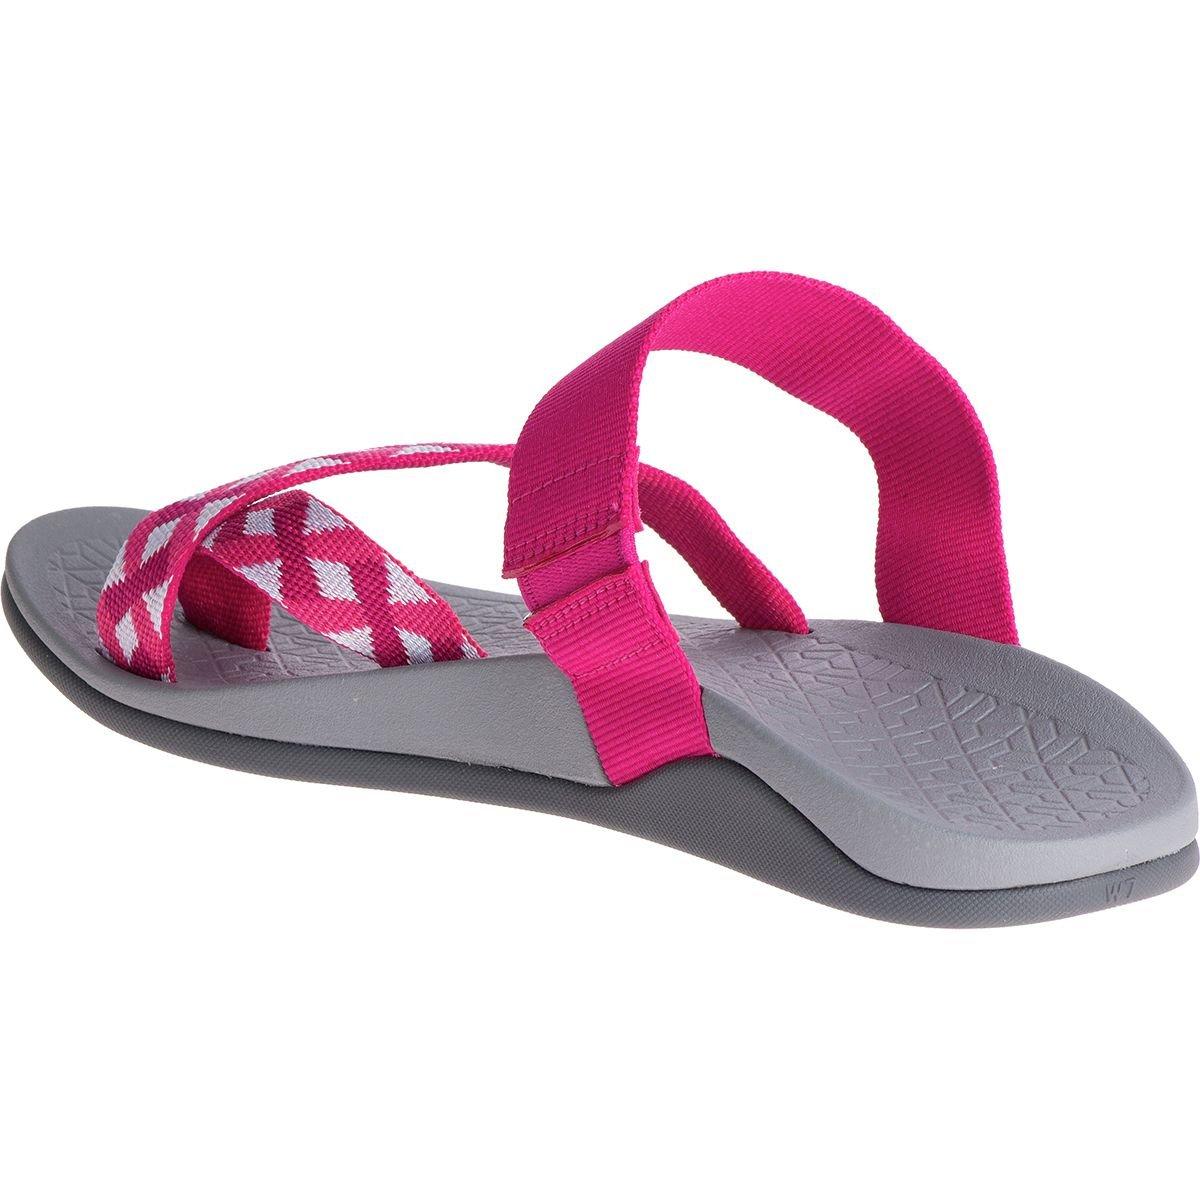 24f0a1d3dfe9 Chaco Women s Tetra Cloud Braid Berry Sandal  Amazon.in  Shoes   Handbags